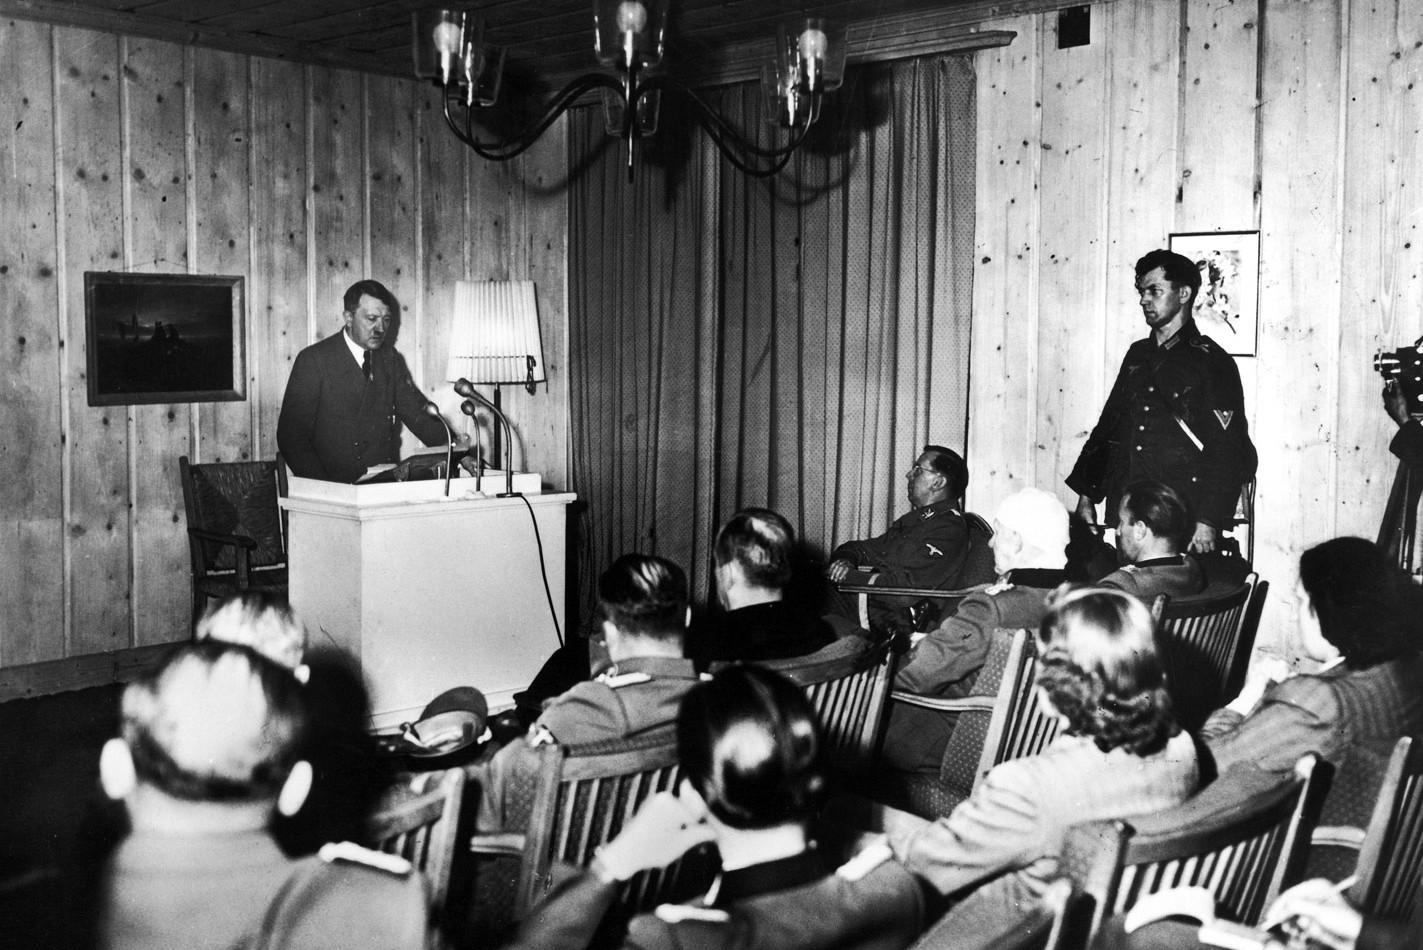 Adolf Hitler tokom jednog skupa sa svojim pristalicama (Foto: Heinrich Hoffmann/Time Life Picture)